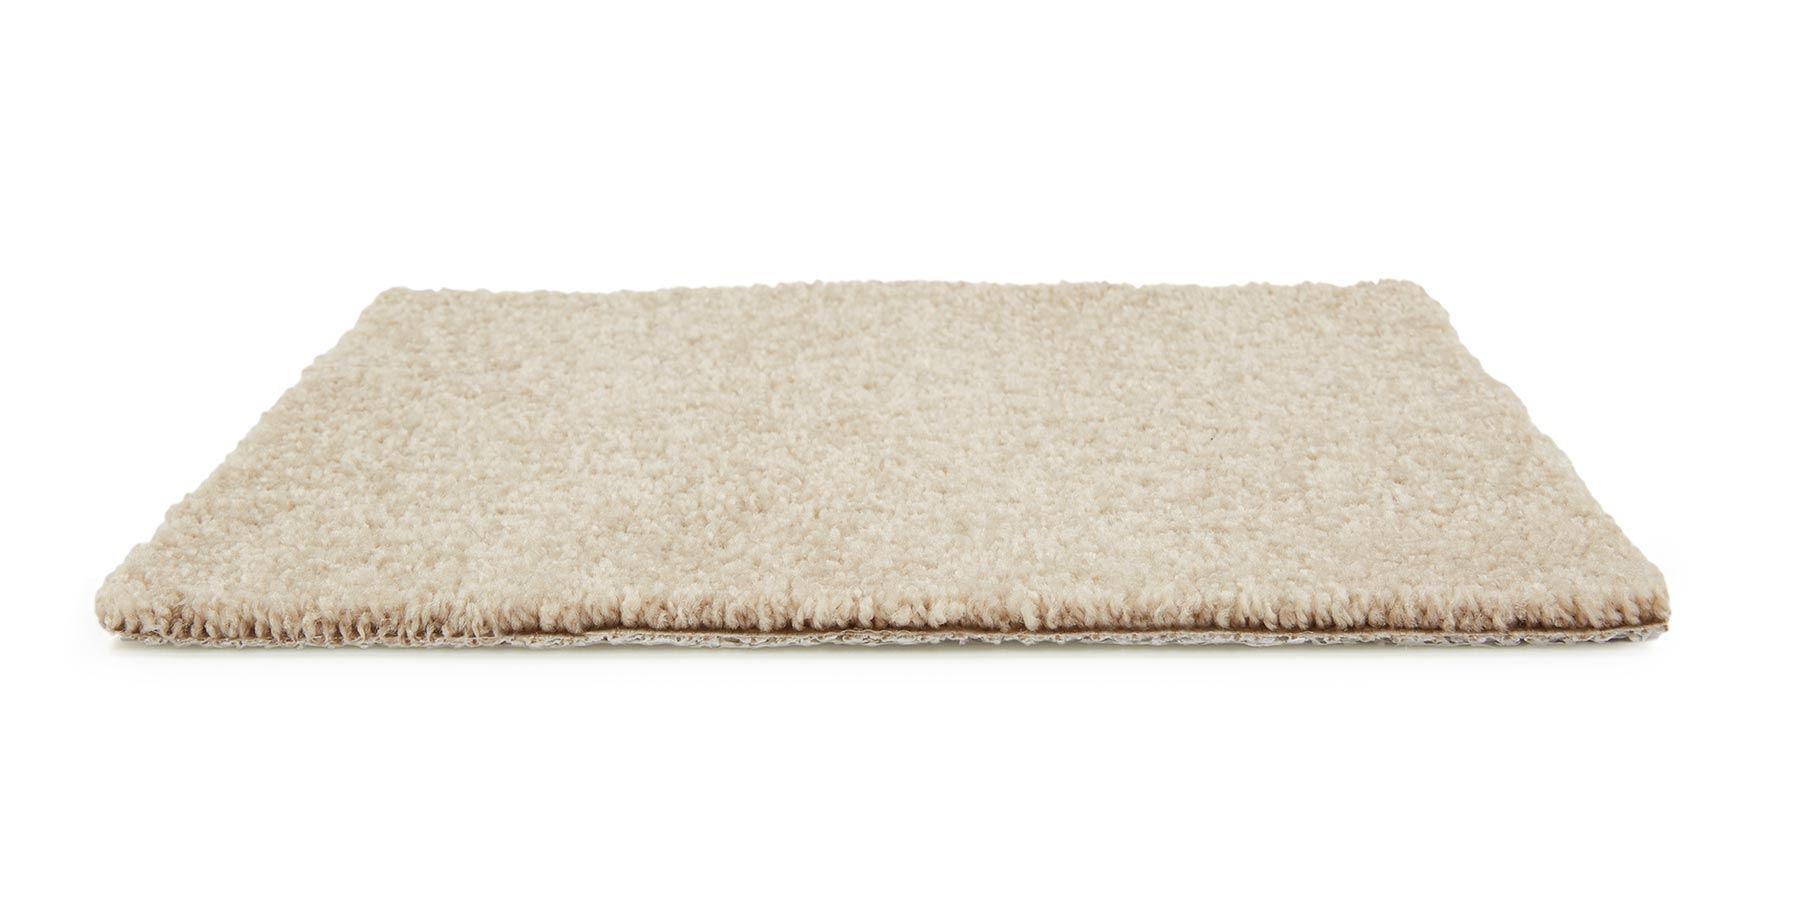 Orion Galaxy Carpet